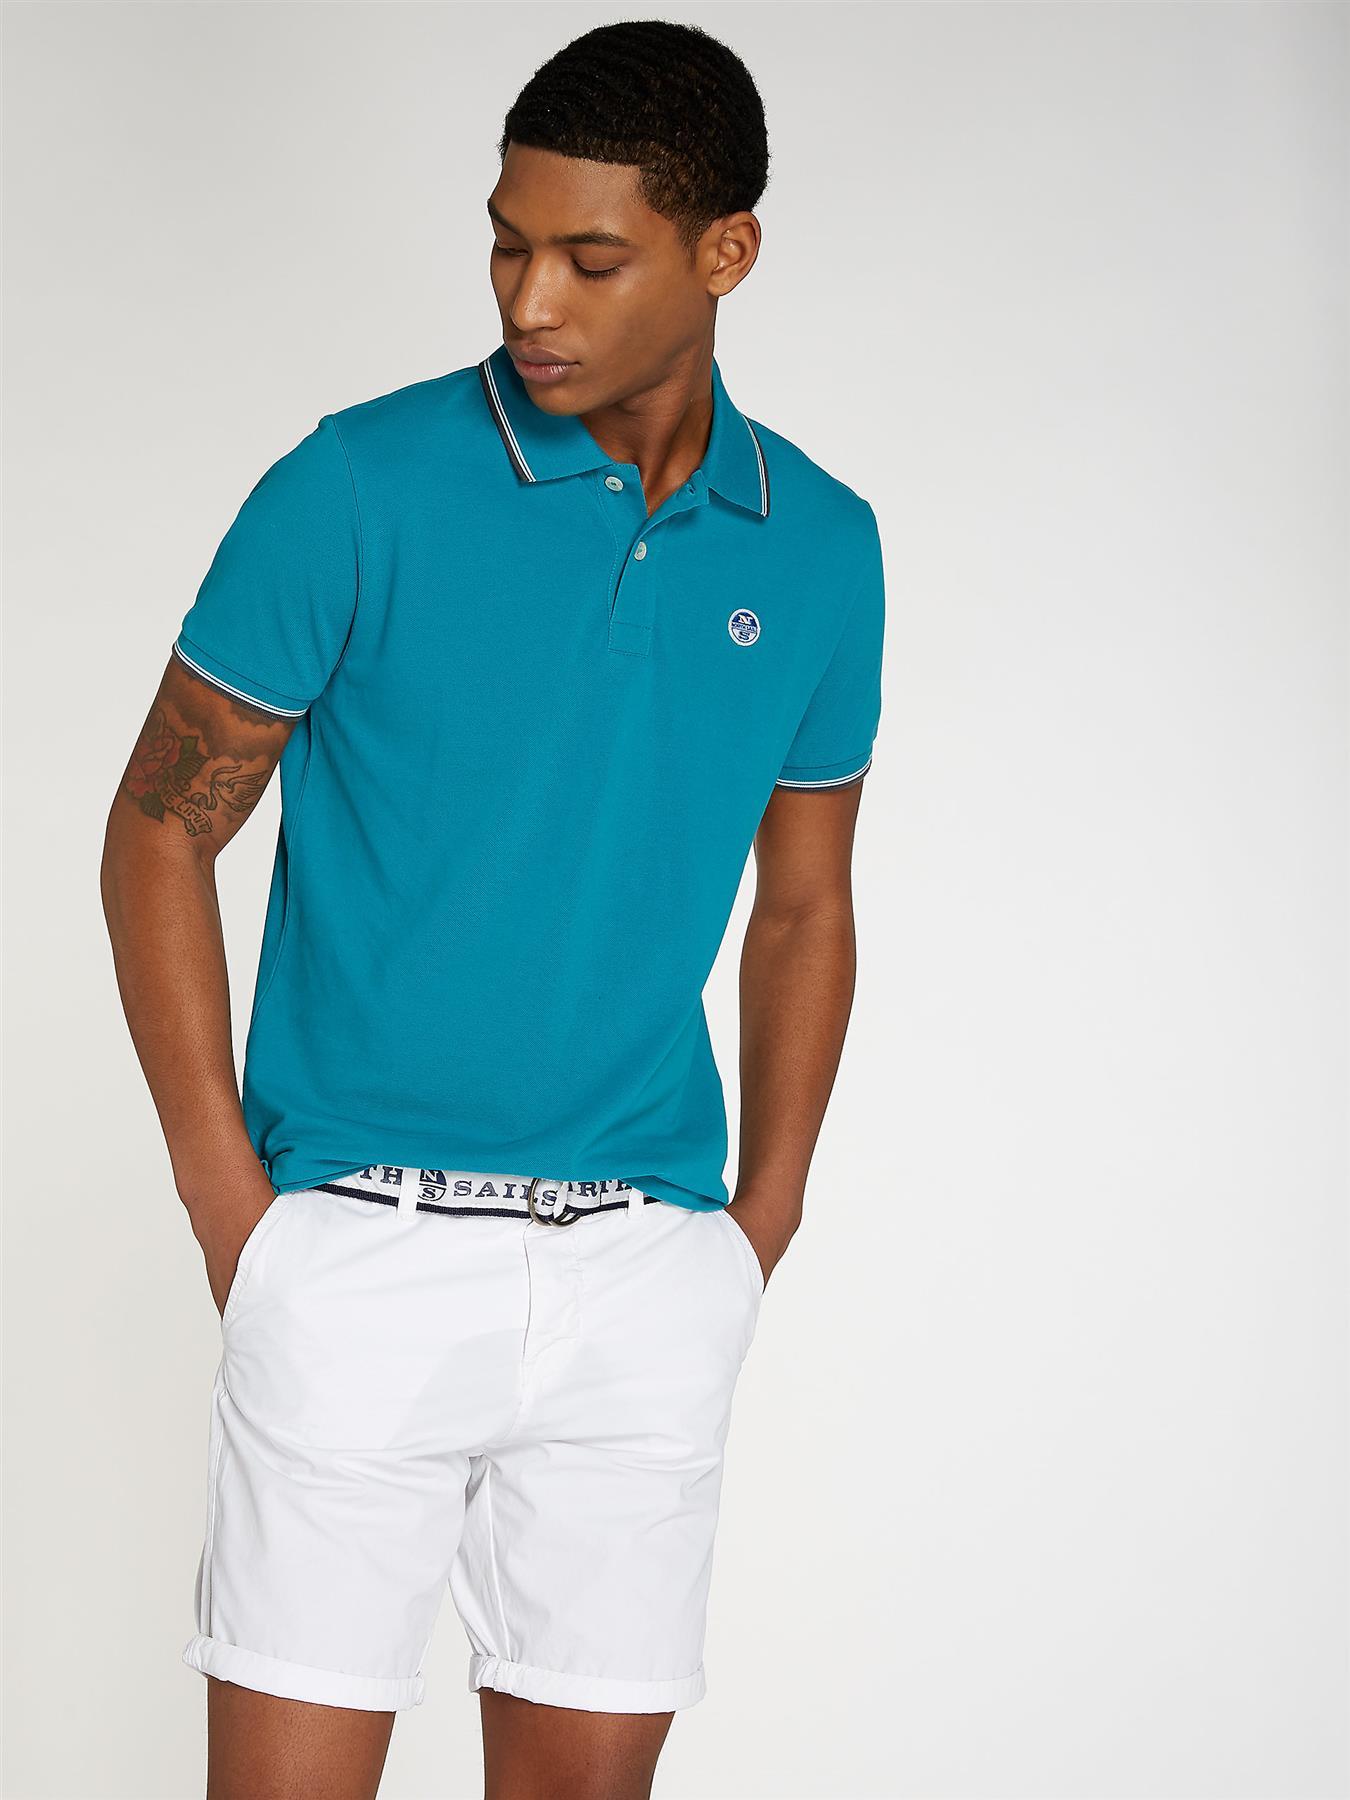 NEW-North-Sails-Legacy-Heritage-Mens-Cotton-Polo-Shirt-Top-Size-S-M-L-XL-XXL-3XL thumbnail 43